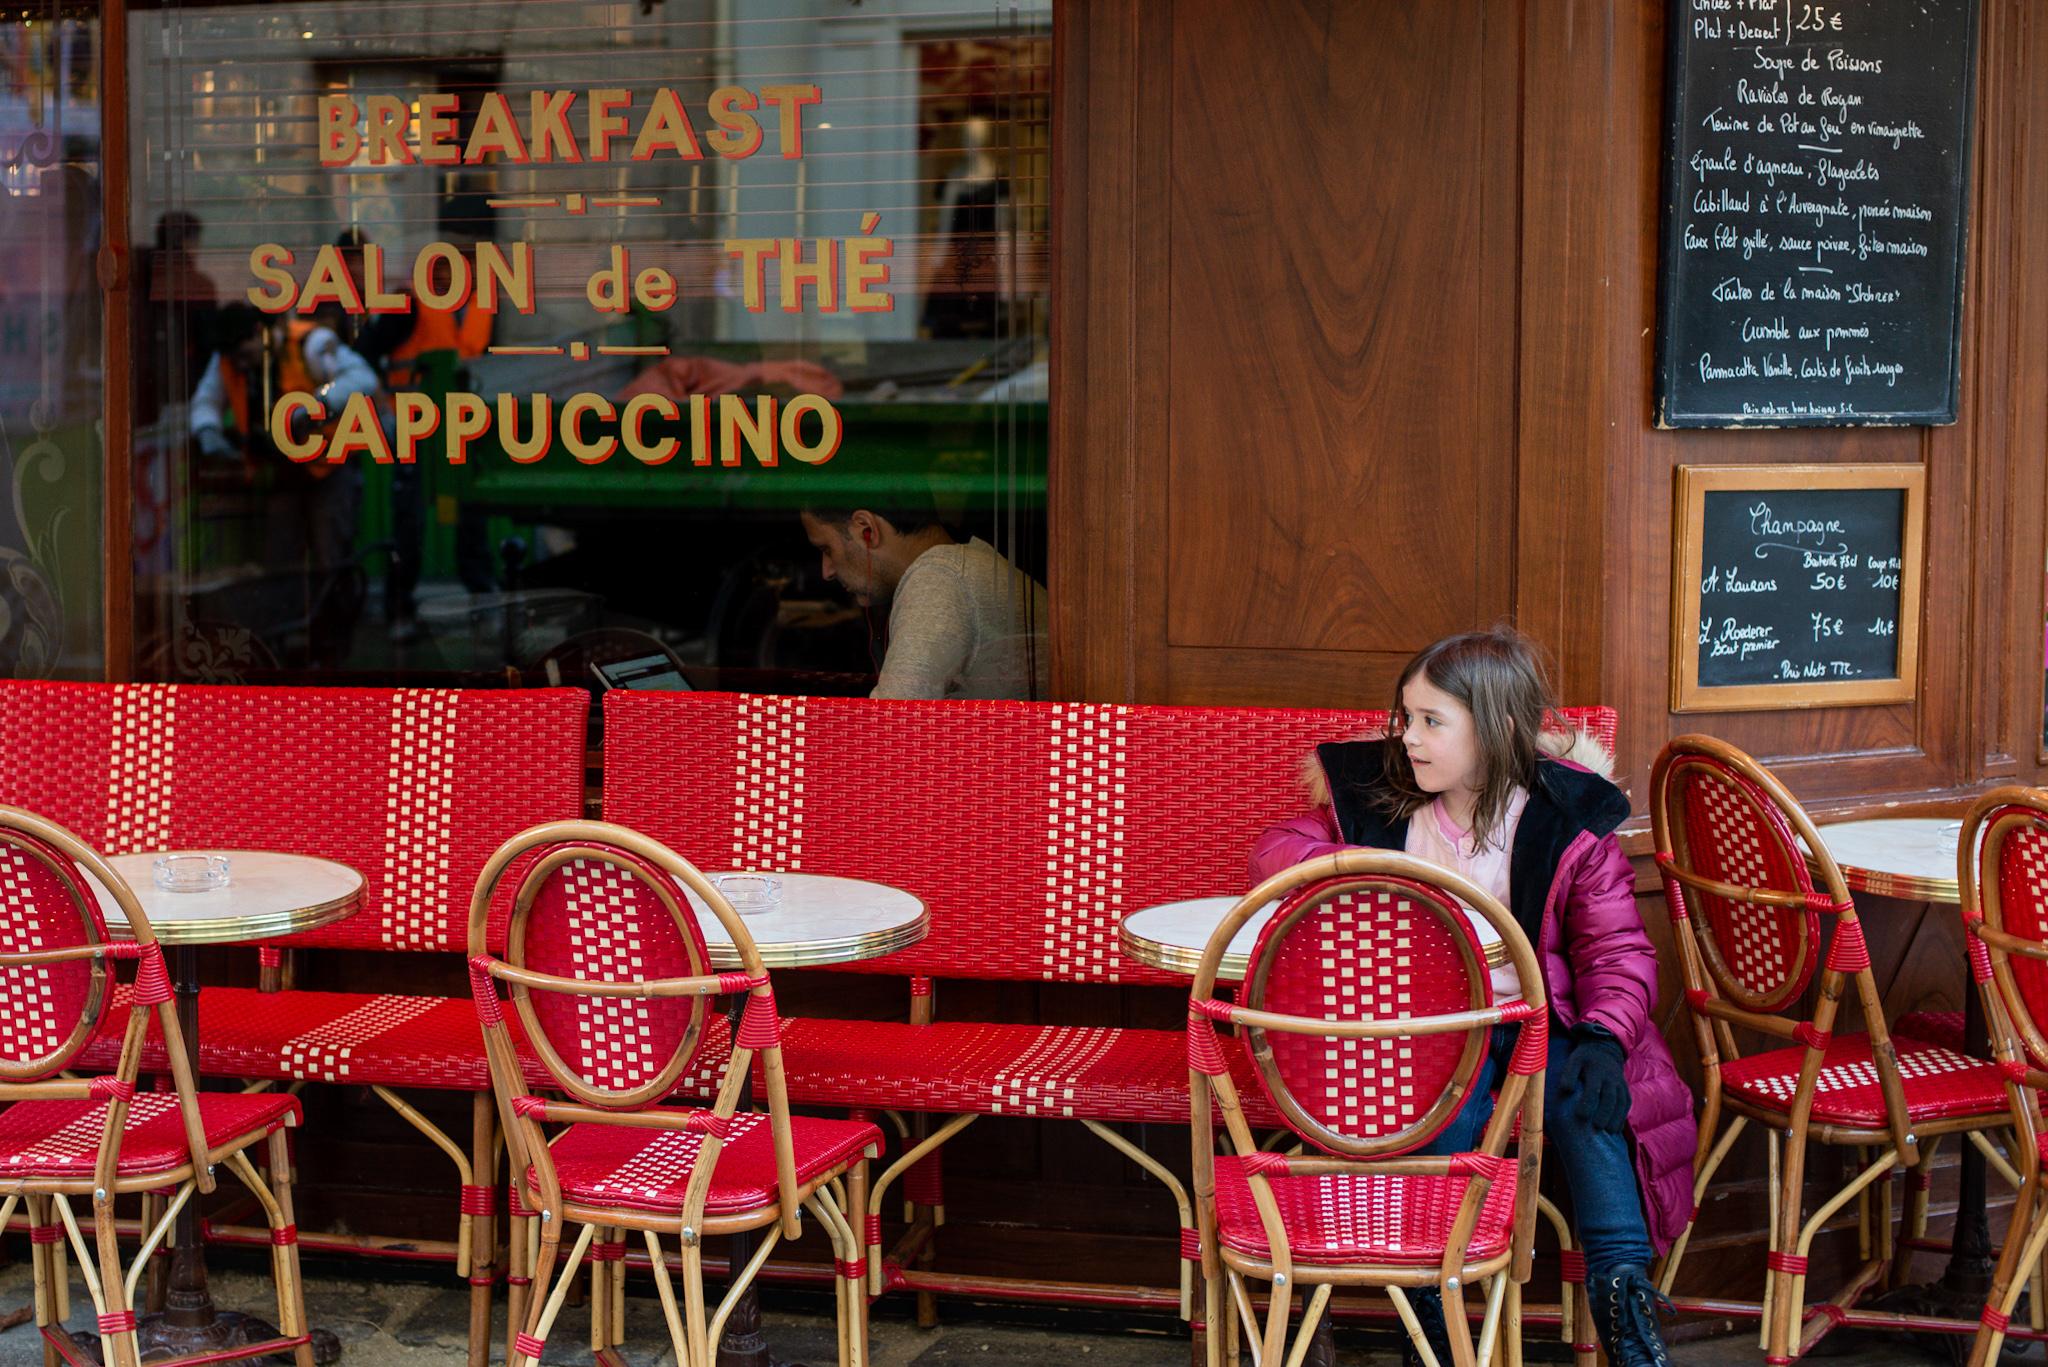 Cafe culture in Paris